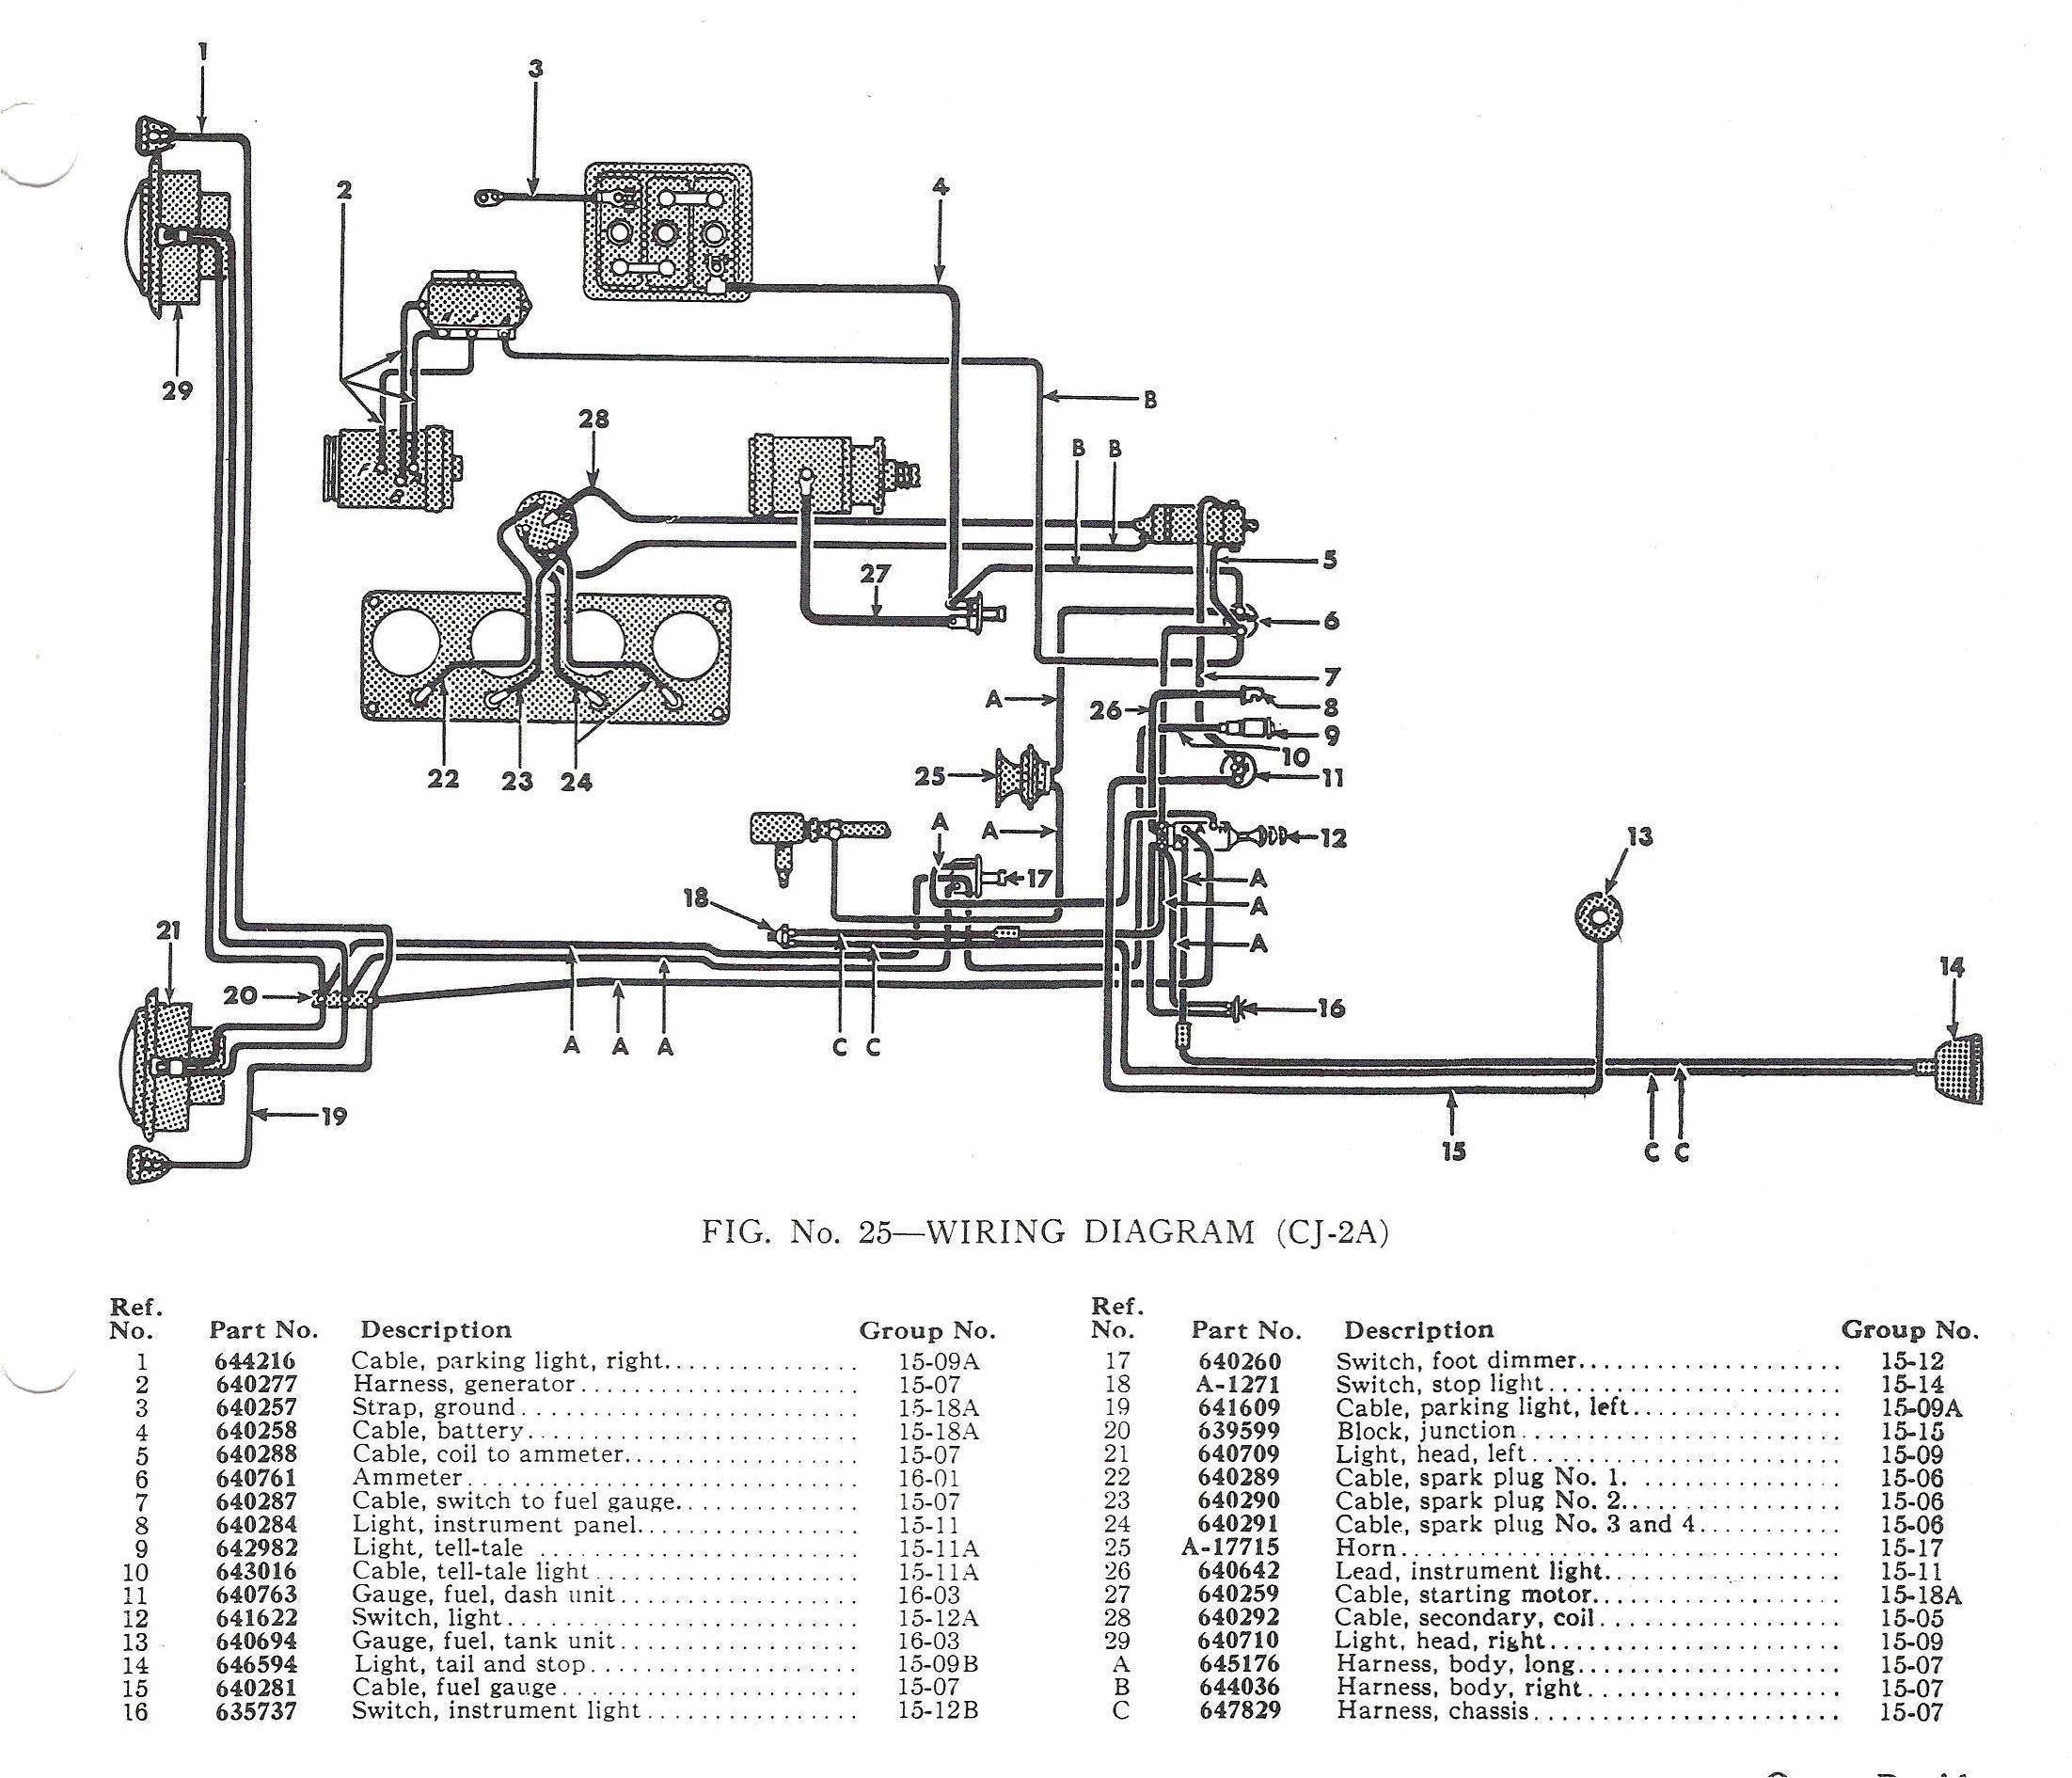 1943 willys jeep wiring diagram wiring diagram blogwiring diagram further 1946 willys jeep truck further 1948